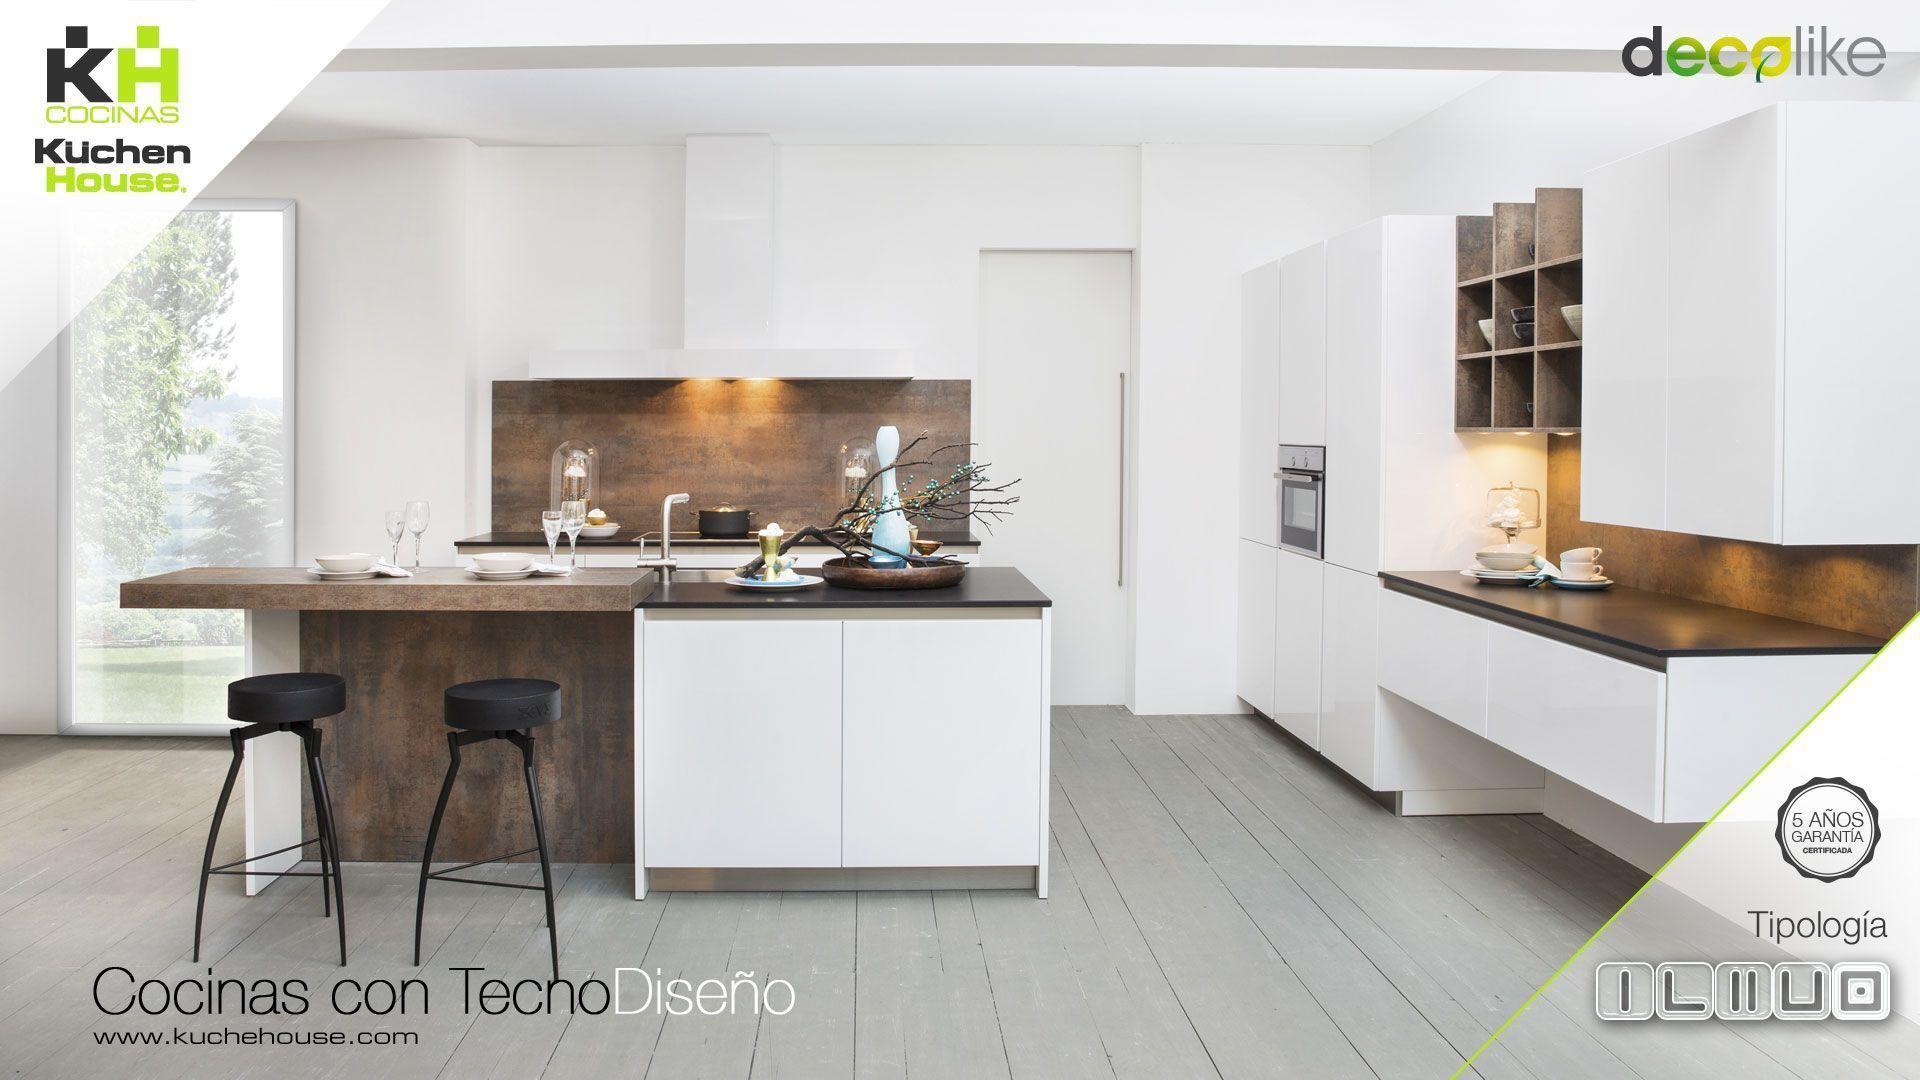 Cocina en Isla - Decolike - KuchenHouse - Reformas - Armarios - Hogar